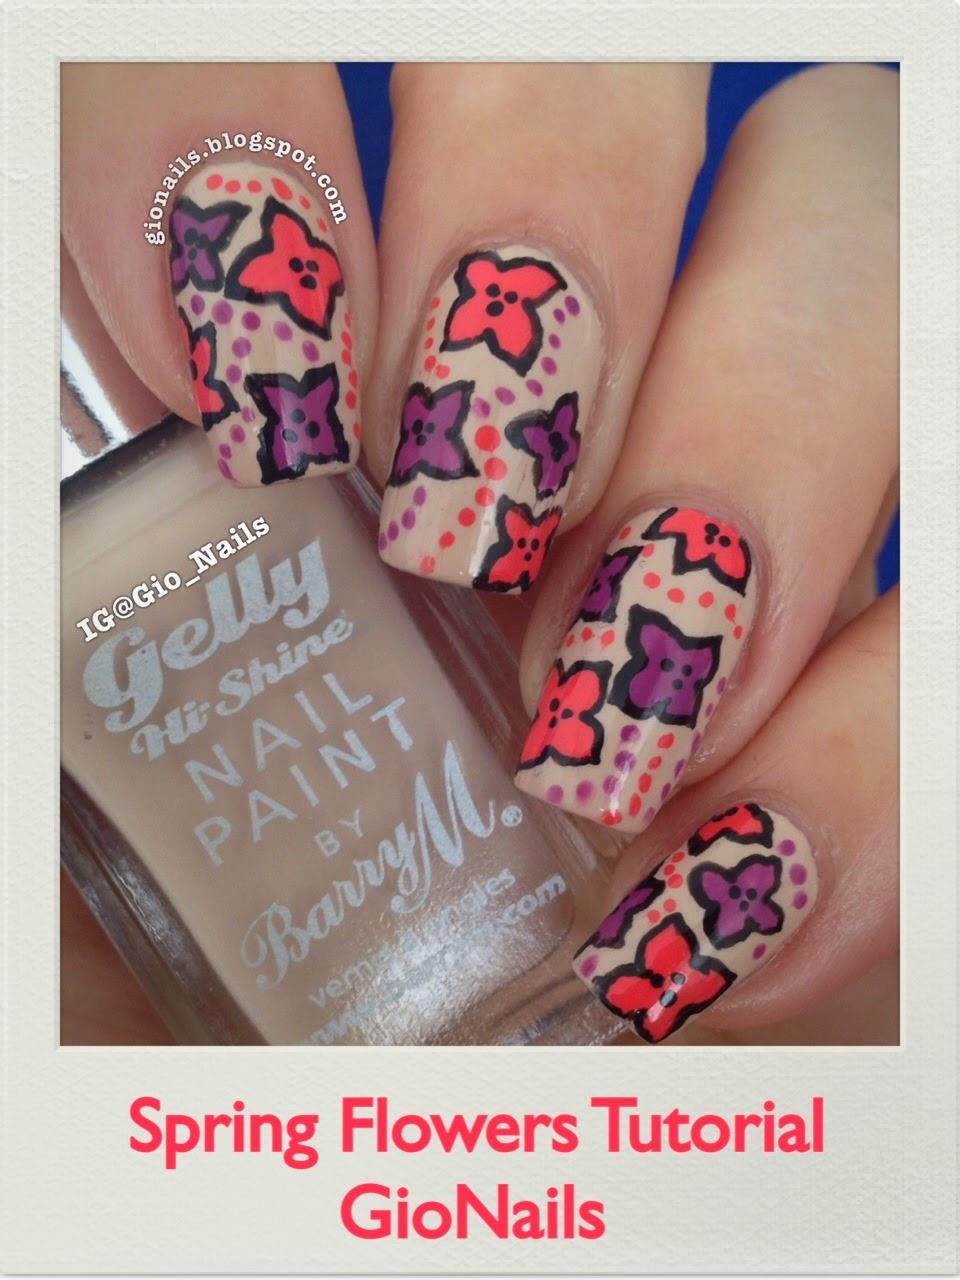 http://gionails.blogspot.be/2014/05/spring-flowers-tutorial.html